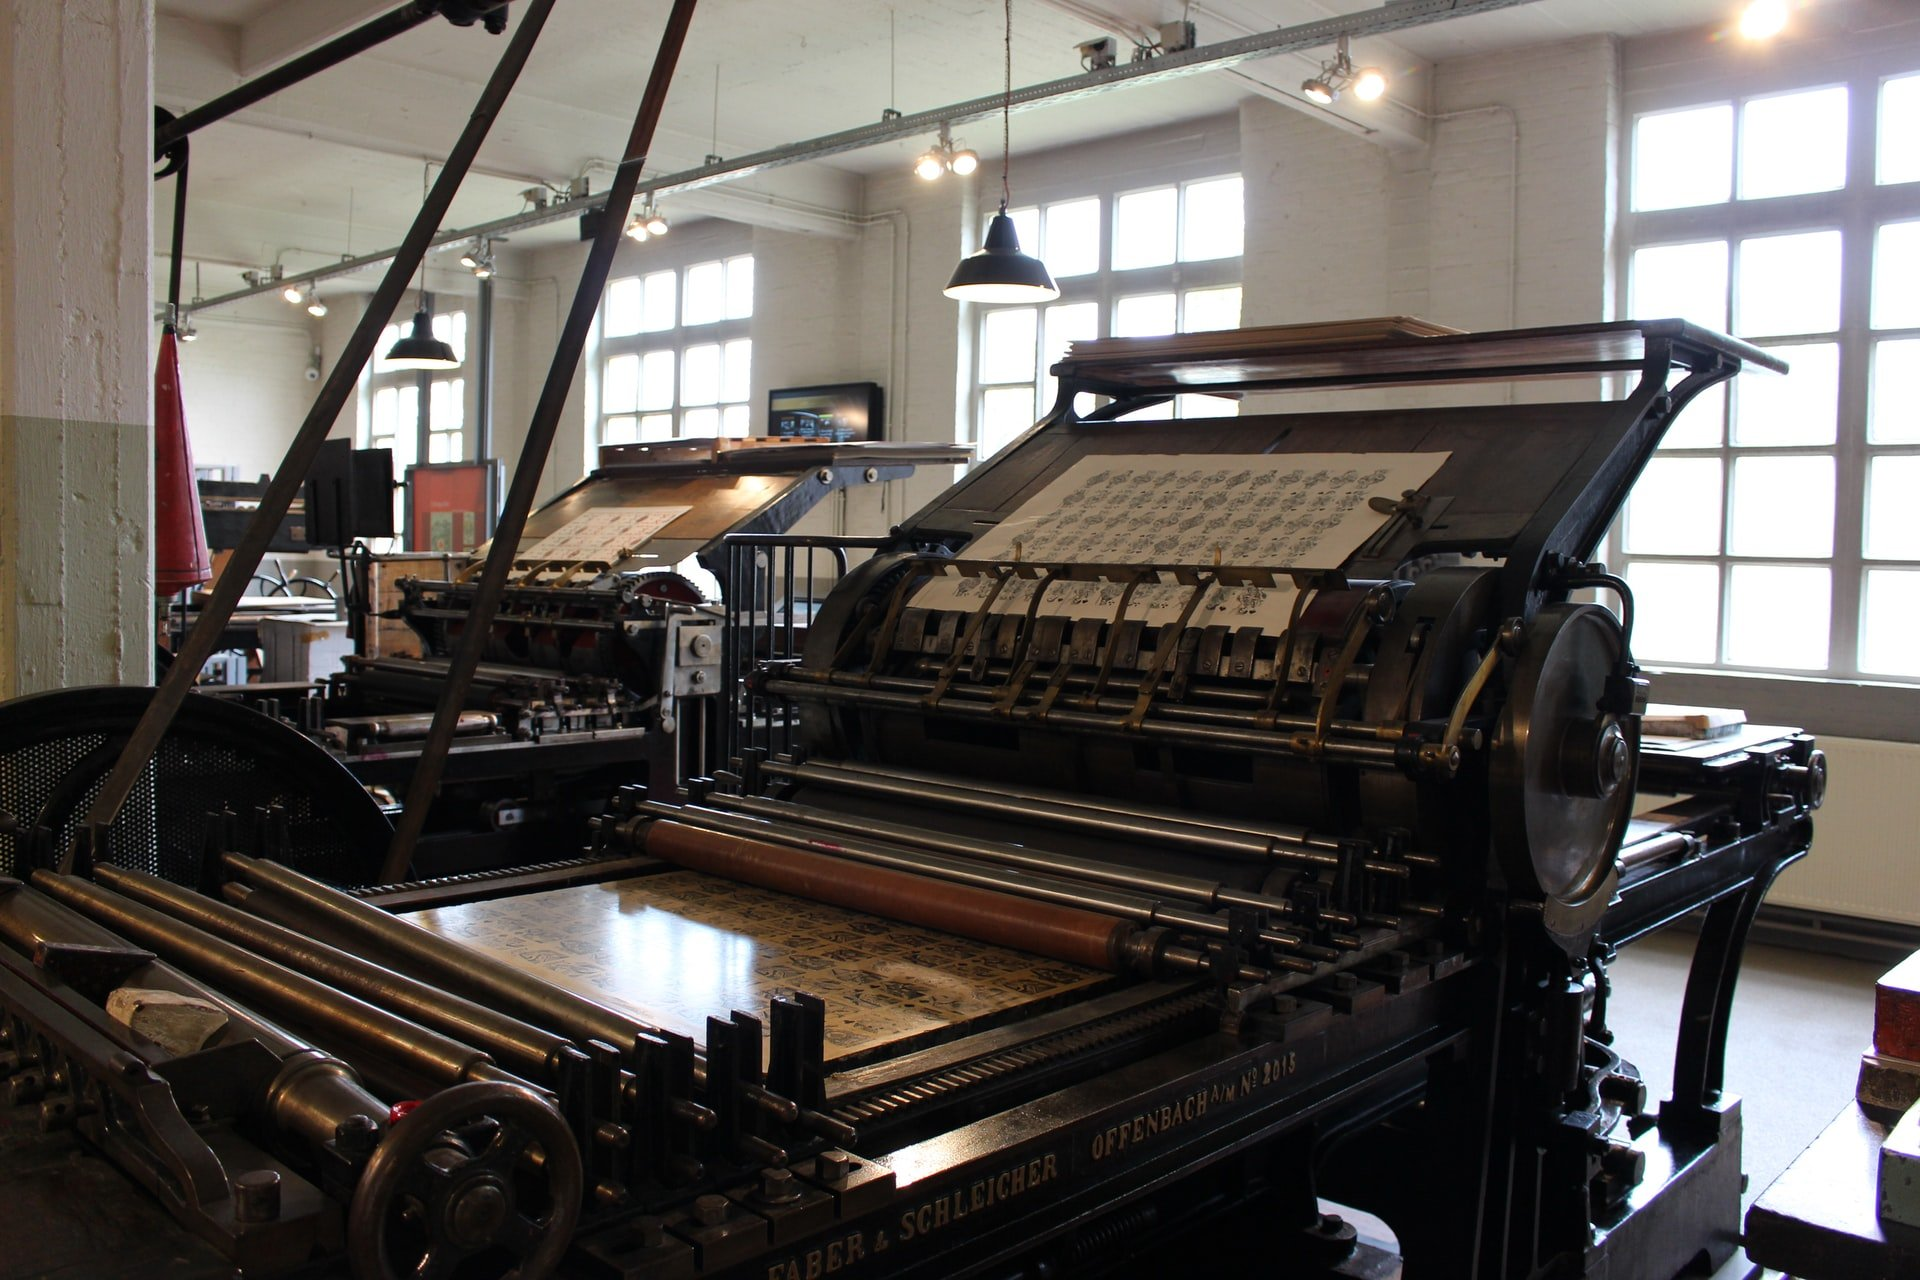 Print Transformation to Digital